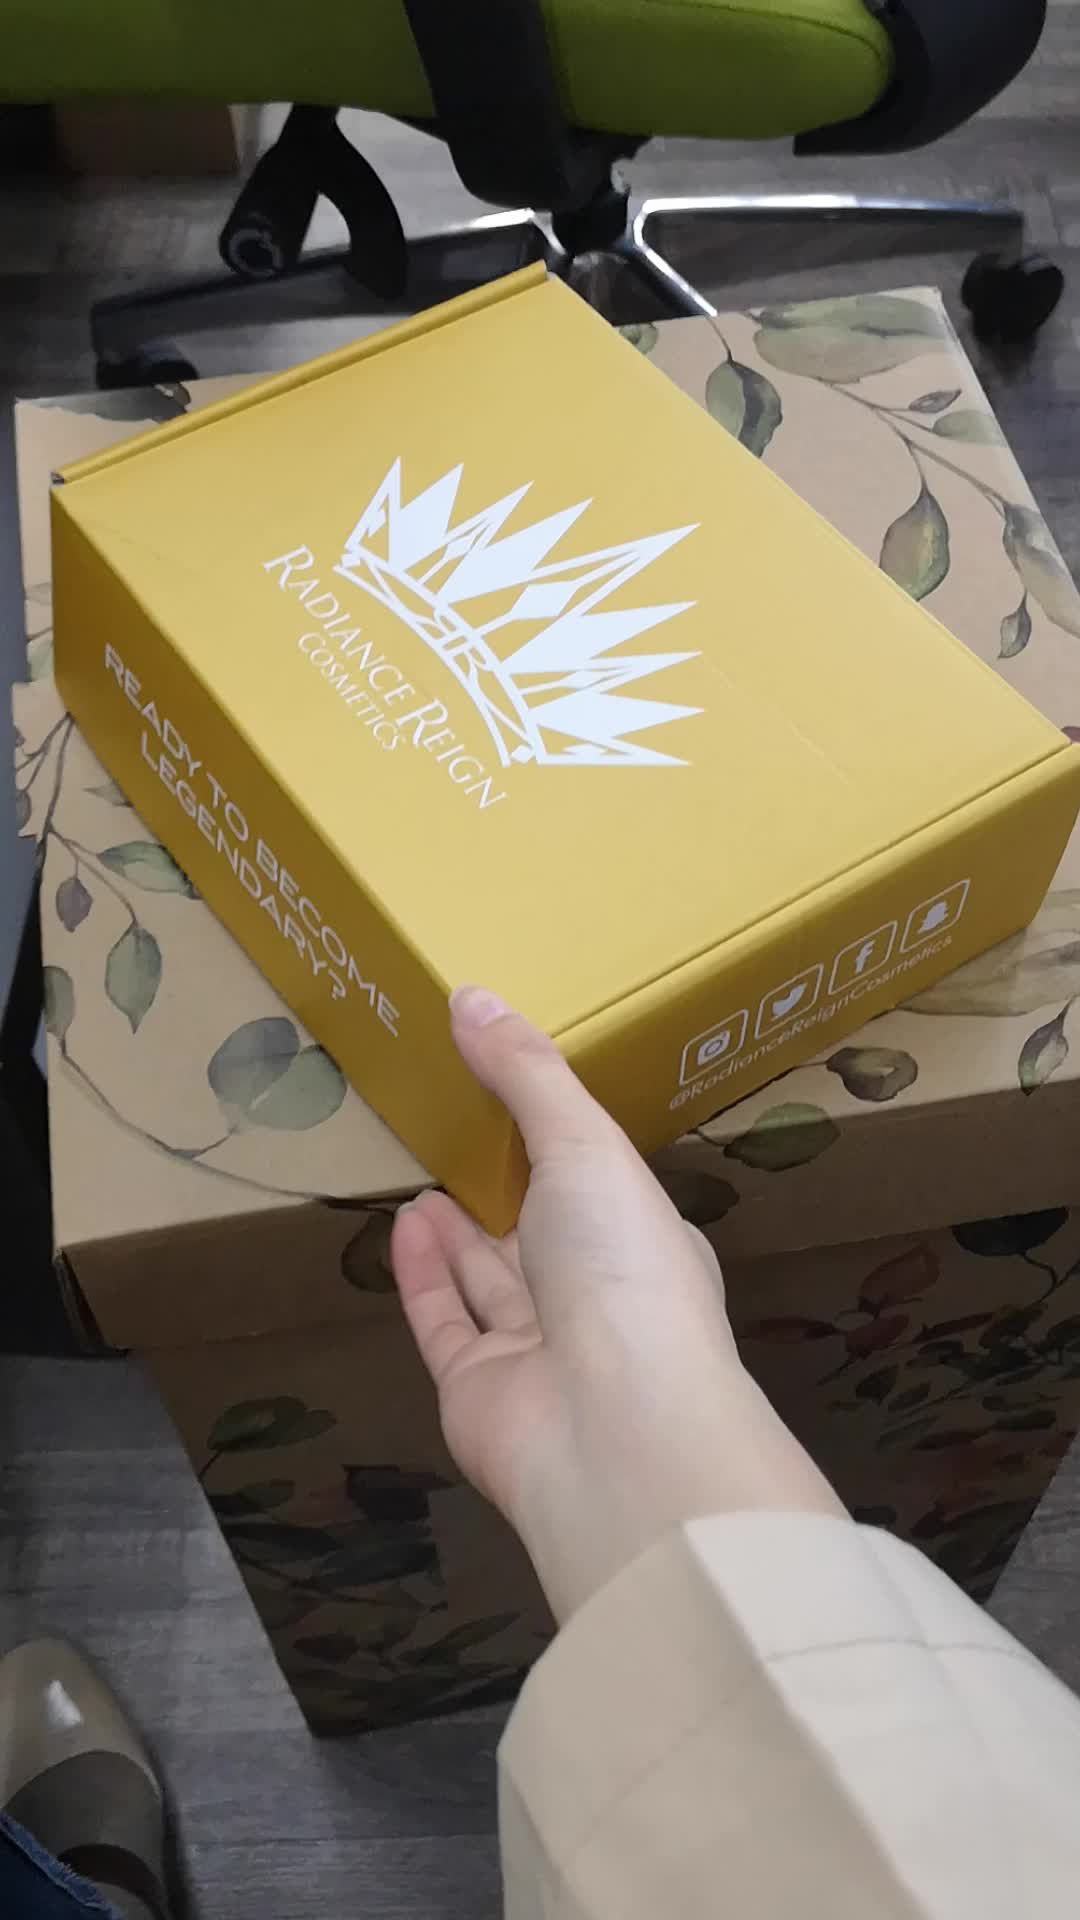 Luxury hard paper 배송 우편물 상자 금 호 일 custom 골 판지 포장 와 무늬를 넣은후 주름을 넣어서 상자